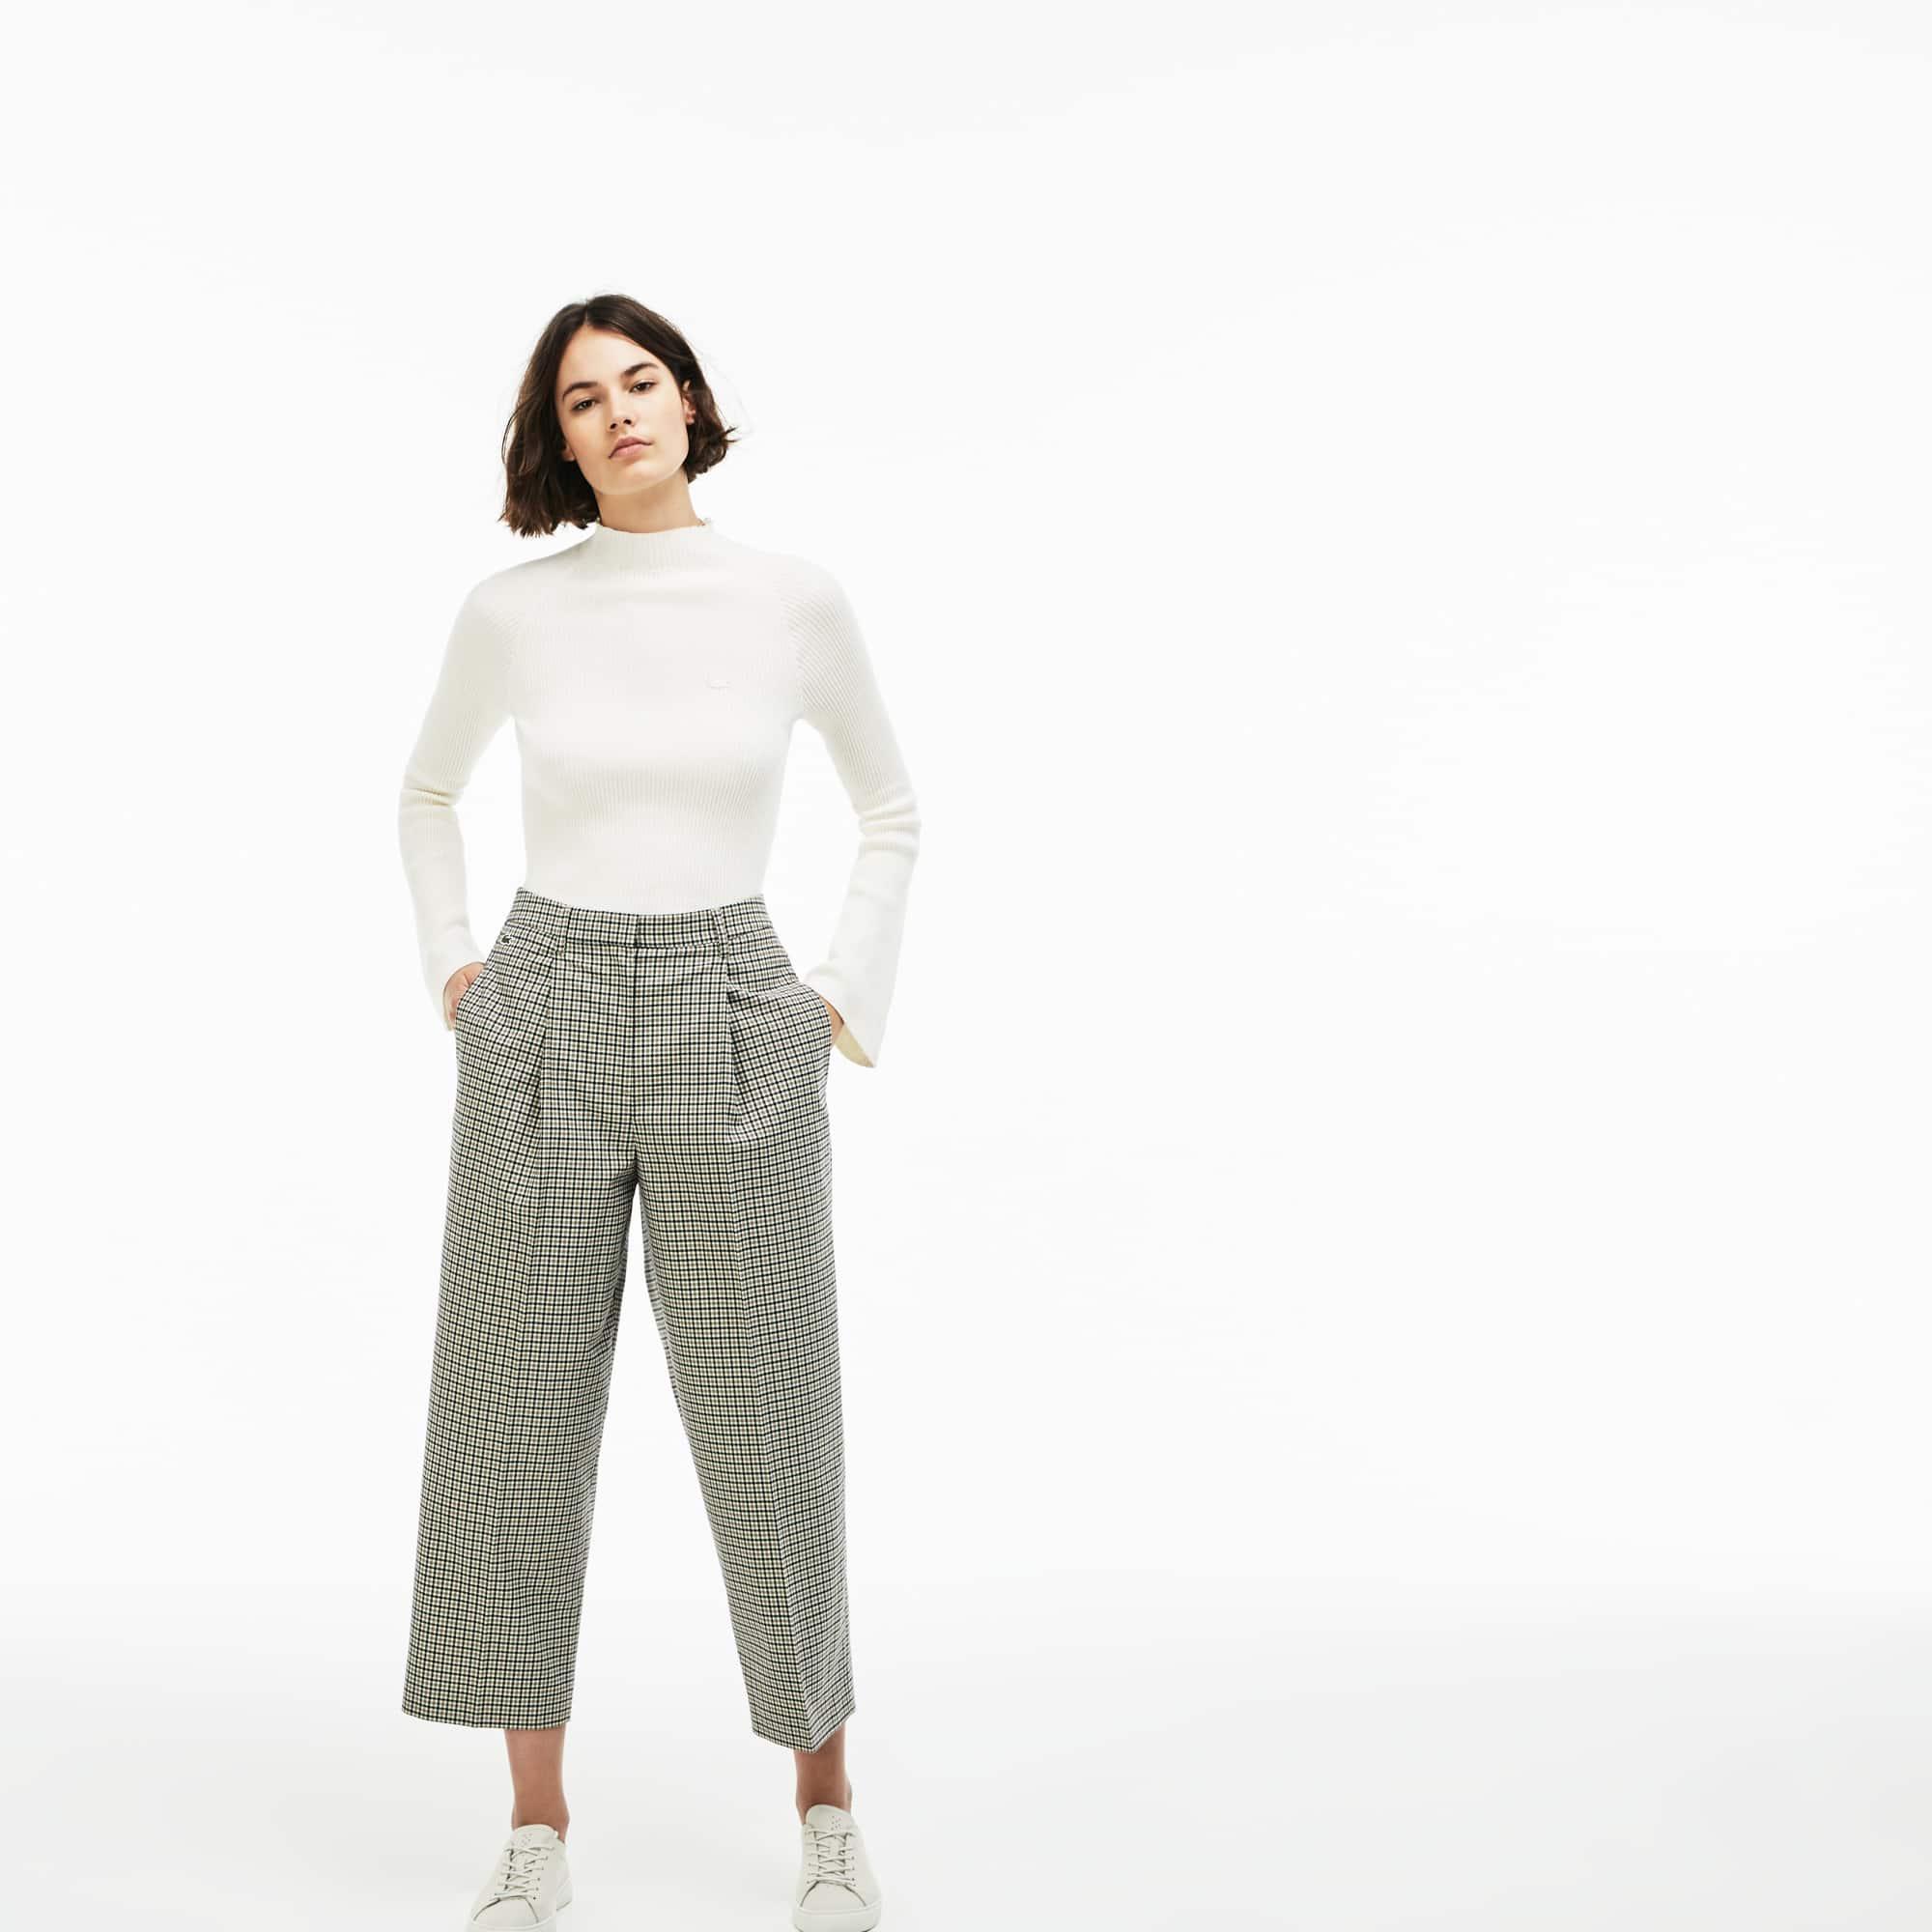 Damen Hosen mit Faltenlegung LACOSTE L!VE